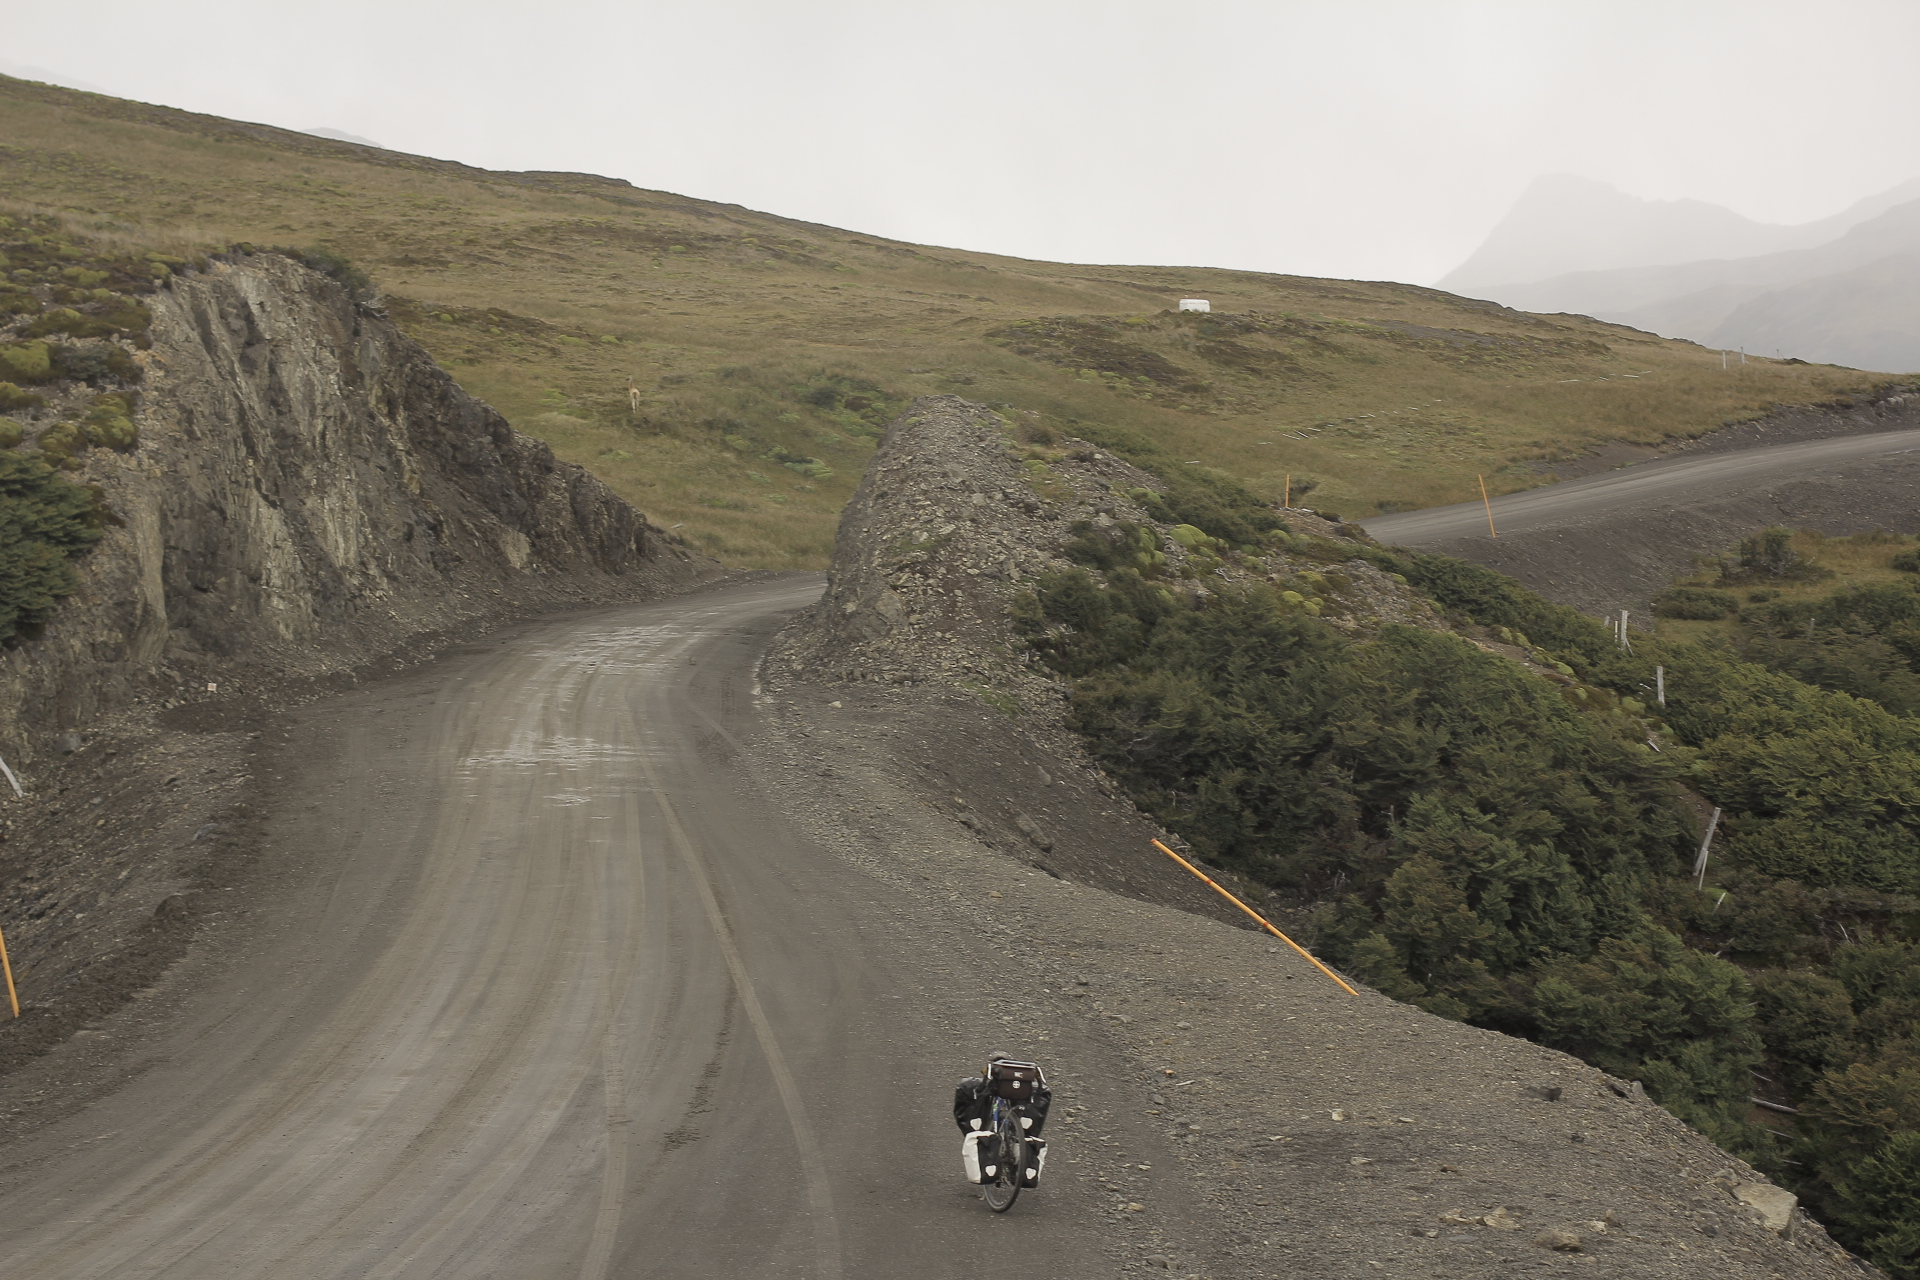 Expresso Patagonia 49